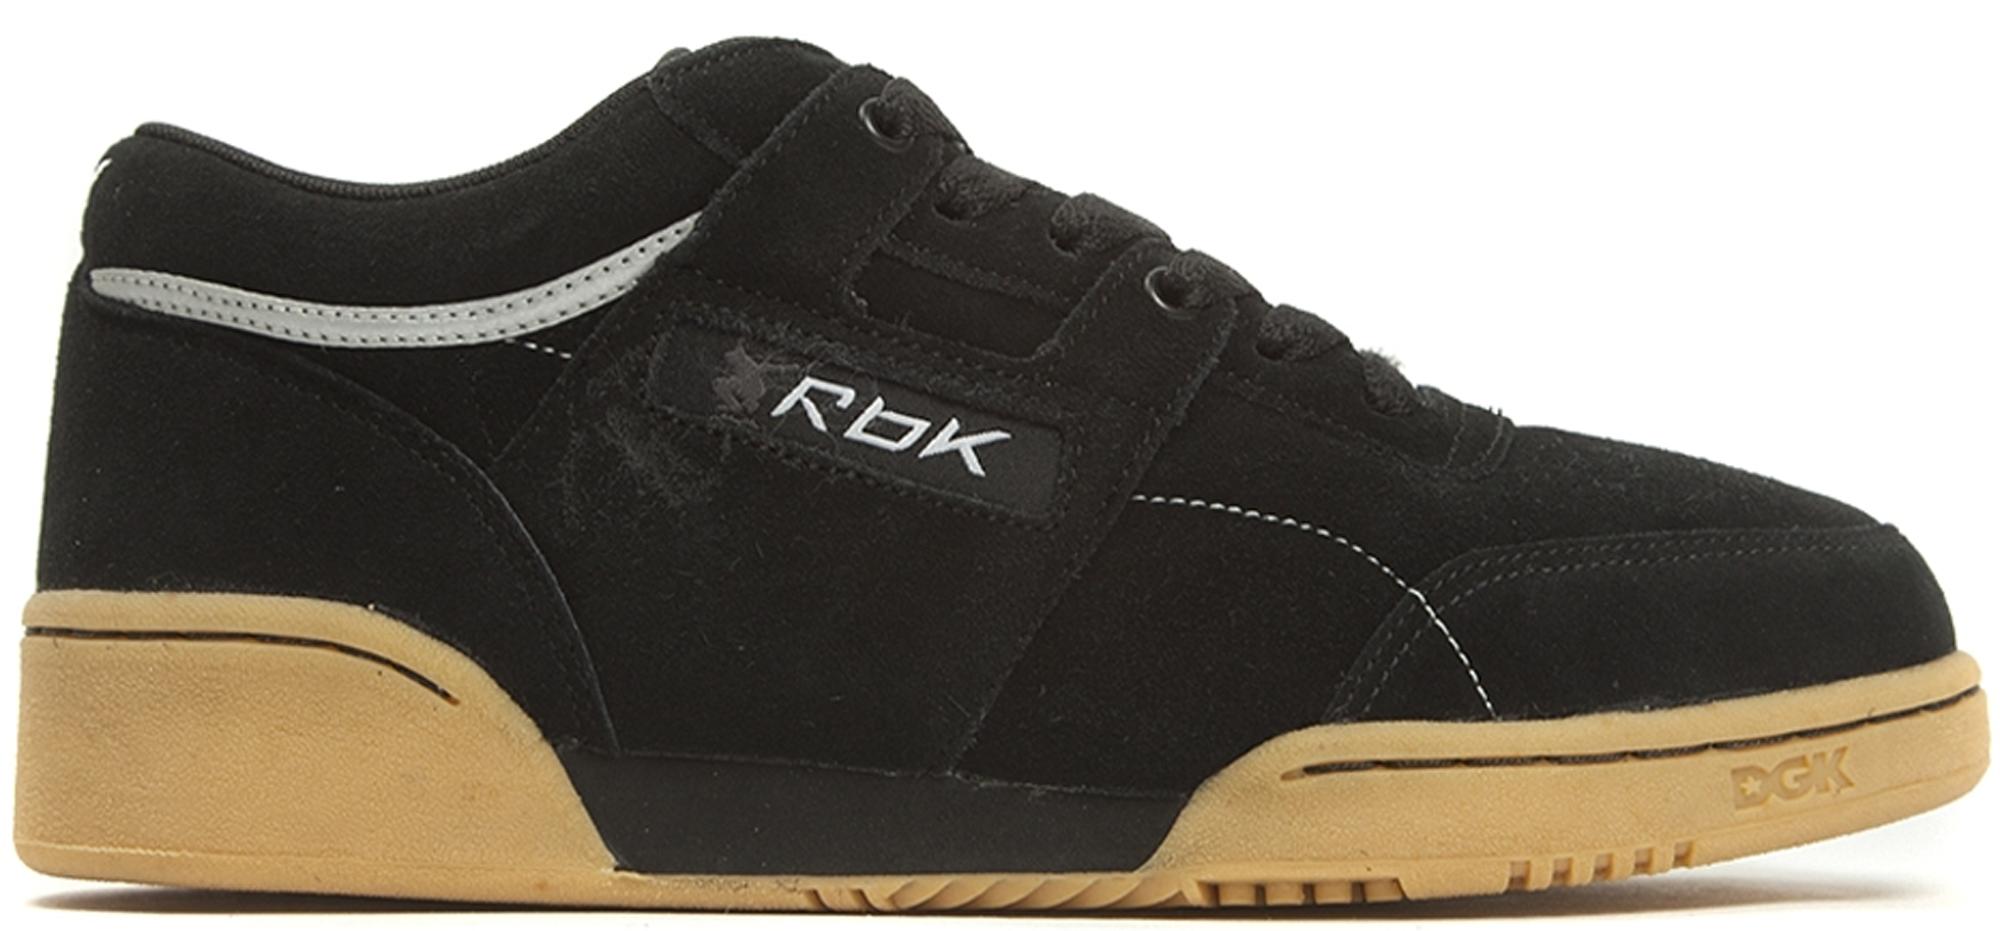 Reebok Workout Lo DGK Black Gum - 34-148016